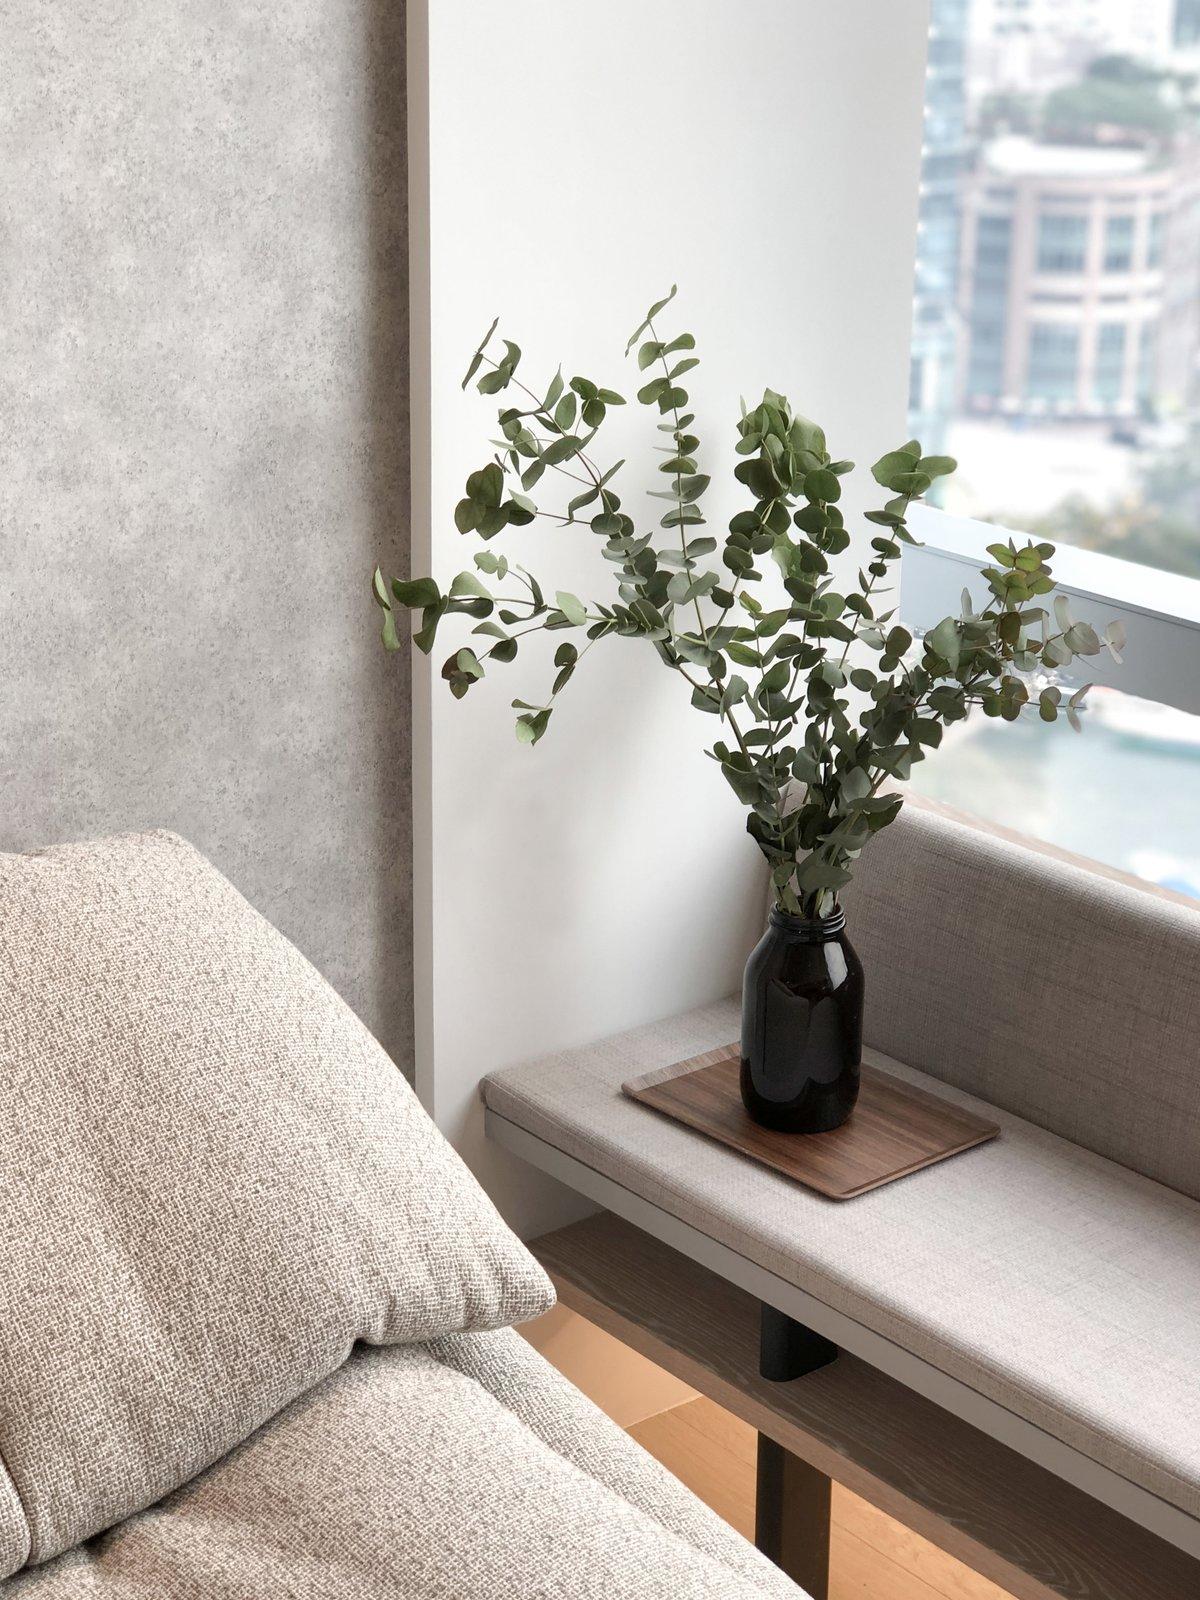 The cozy sofa.   #studioadjective @studioadjective #apartment #home #Sofa   Studio Adjective Ltd.  www.adj.com.hk Instagram : @studioadjective  Larvotto Studio Adjective HONG KONG by Studio Adjective Ltd. HK